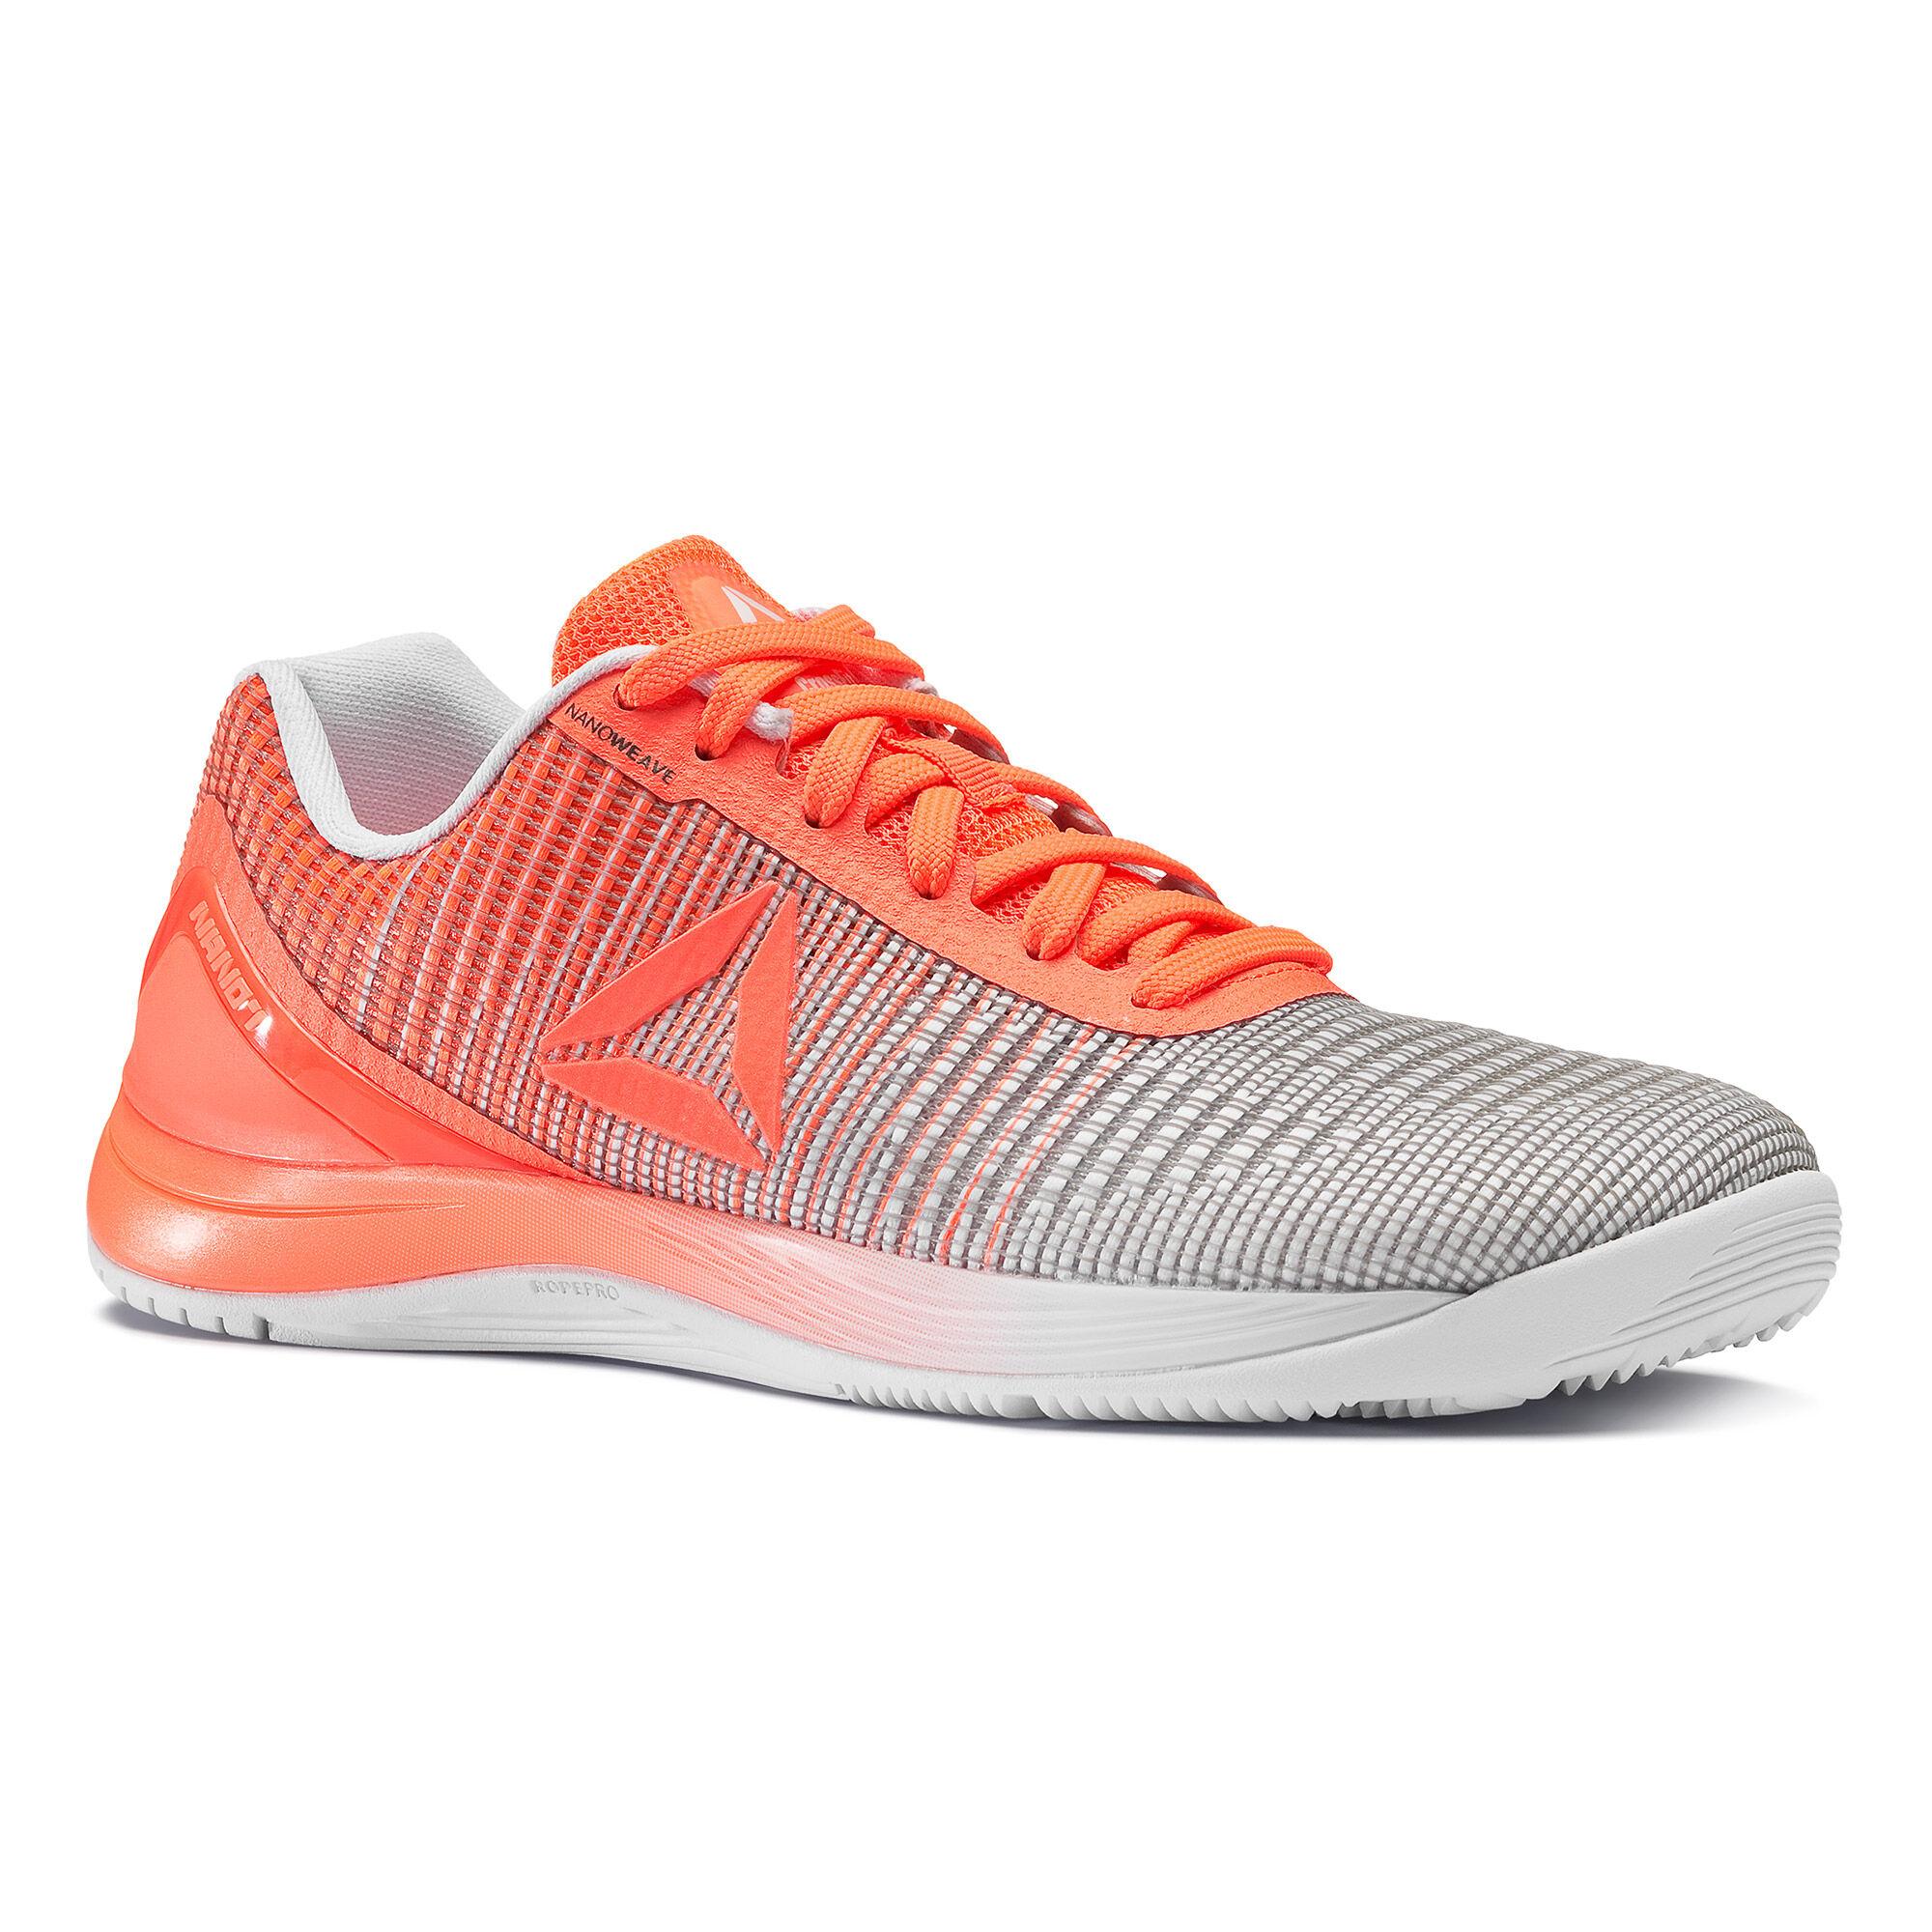 Reebok Training Shoes Cross Fit Nano 7 For Women White BS8353